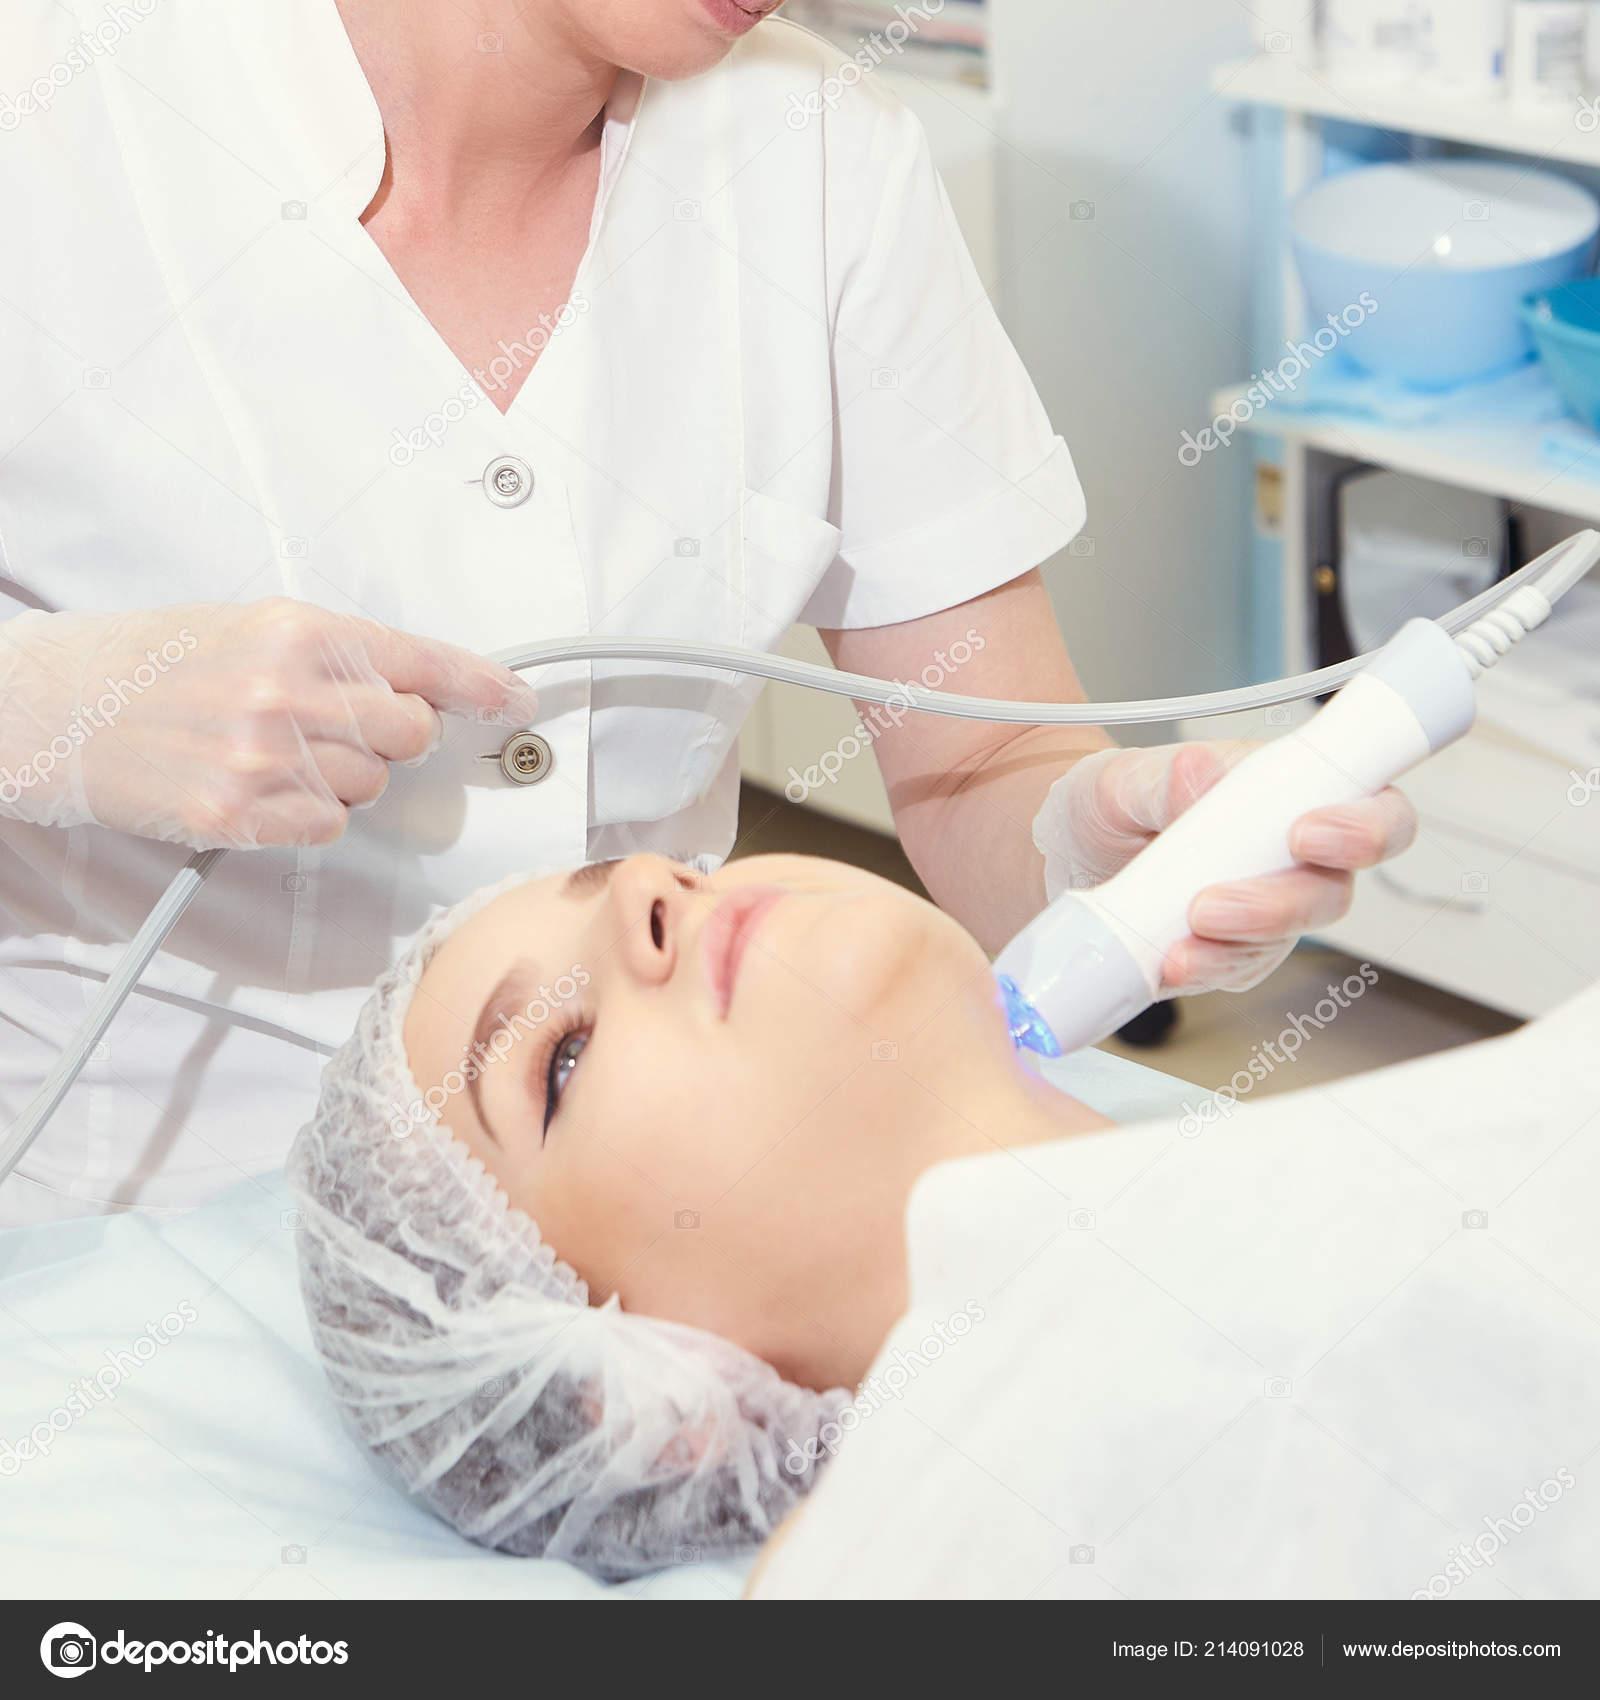 Cosmetology Light Equipment Age Wrinkle Microcurrent Medicine